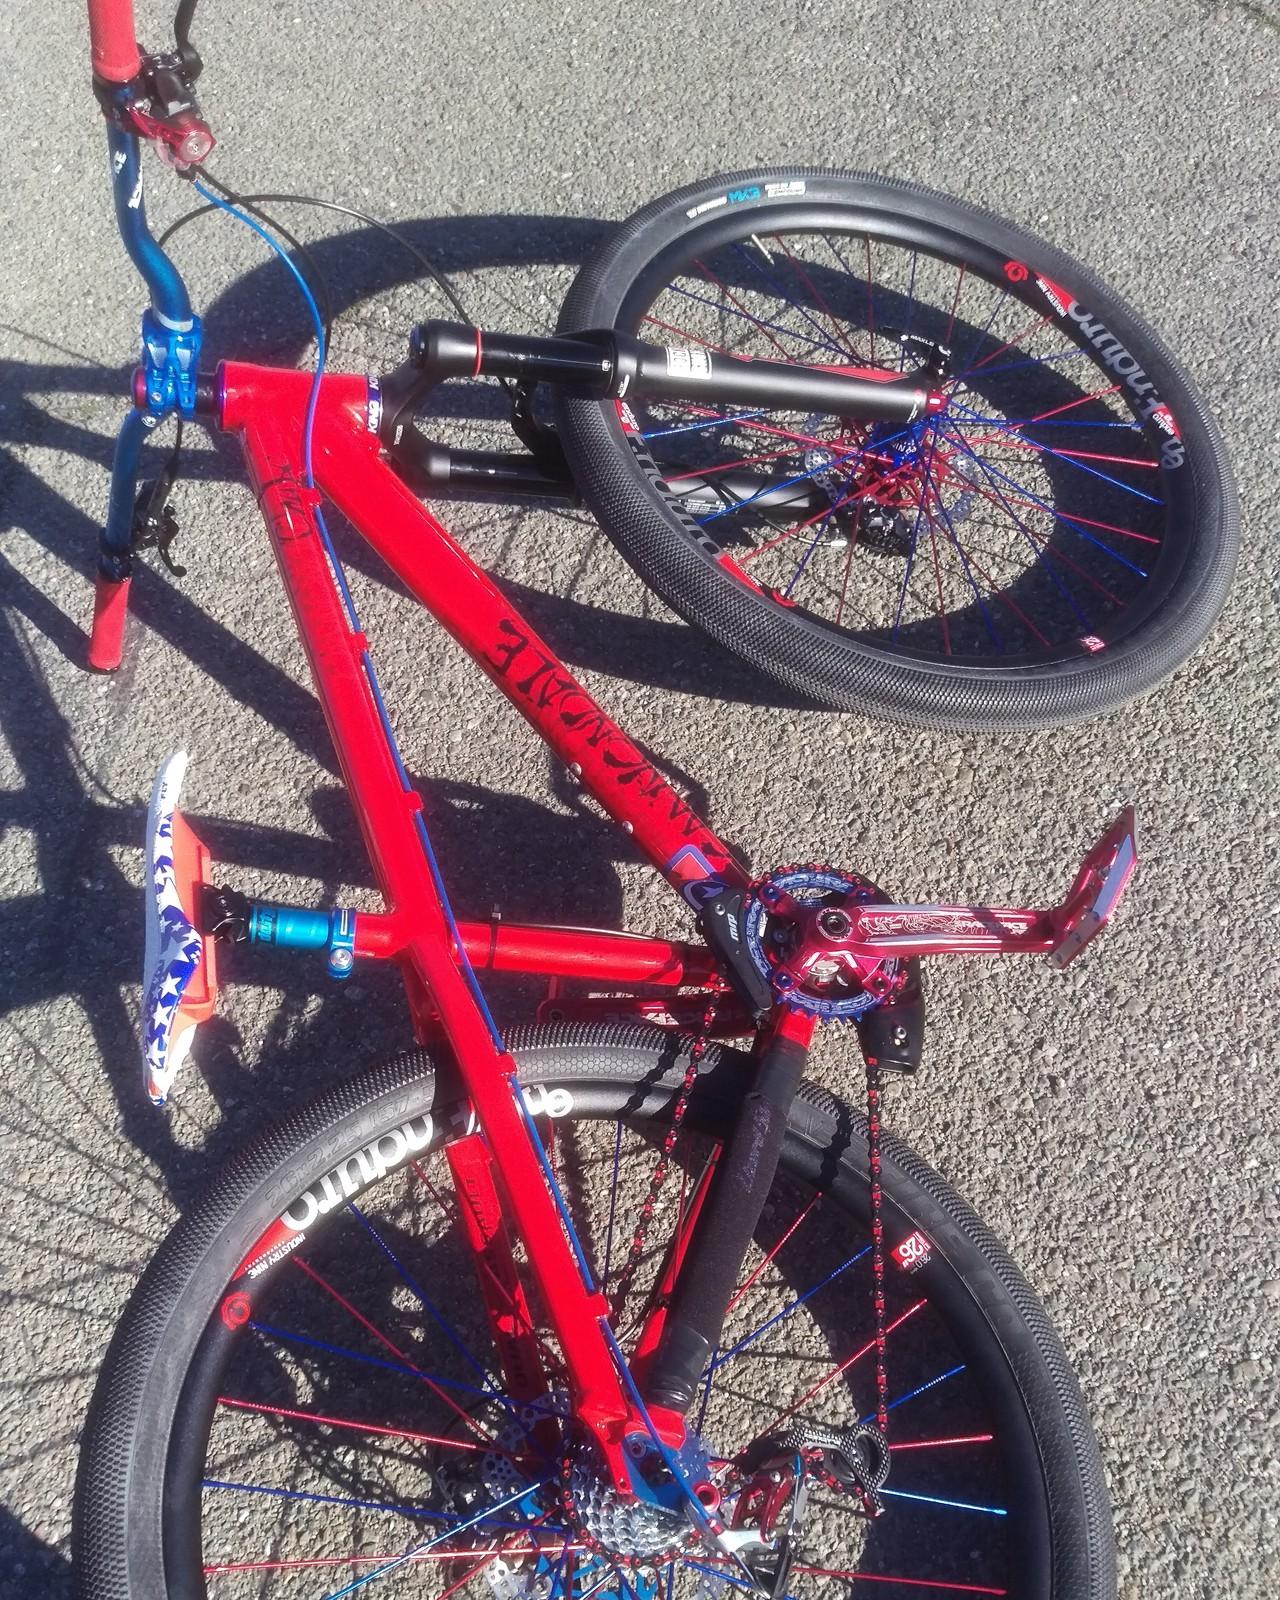 IMG 20161224 161149 - 1morebike - Mountain Biking Pictures - Vital MTB